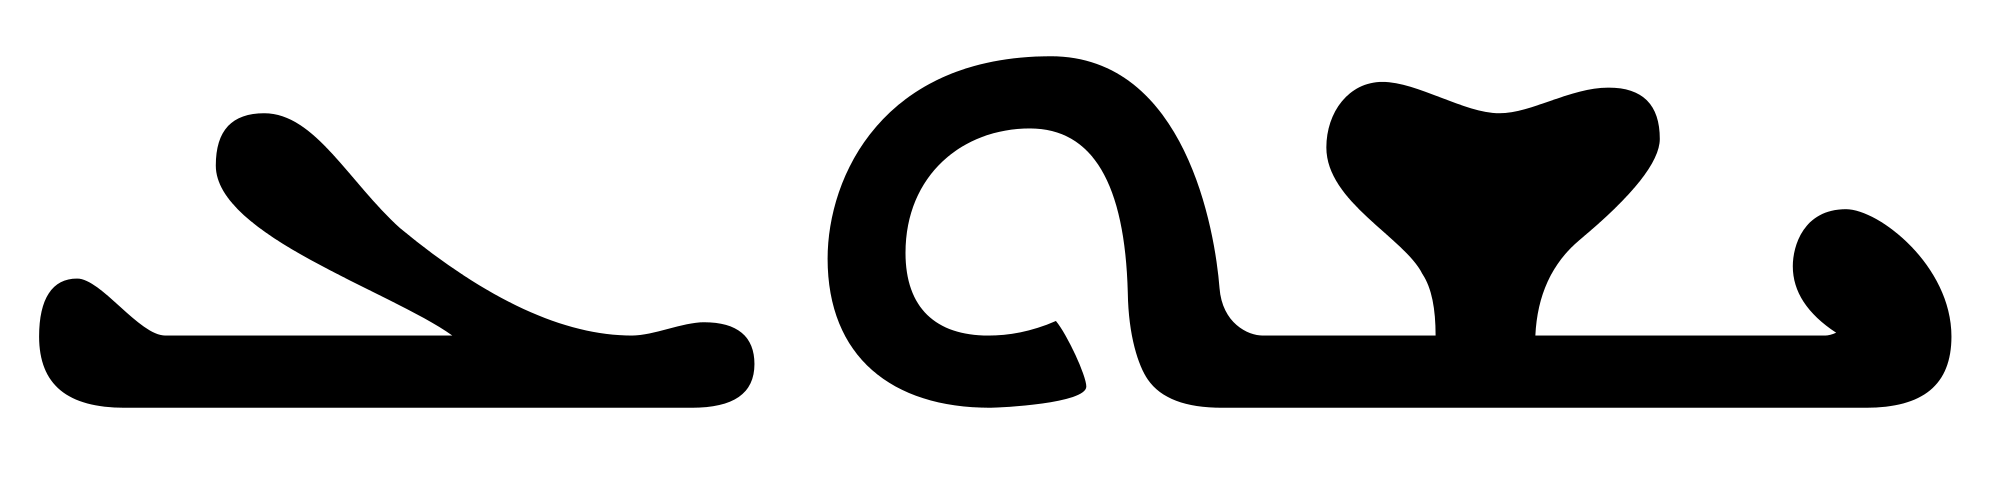 clip art black and white jesus svg name #98352021